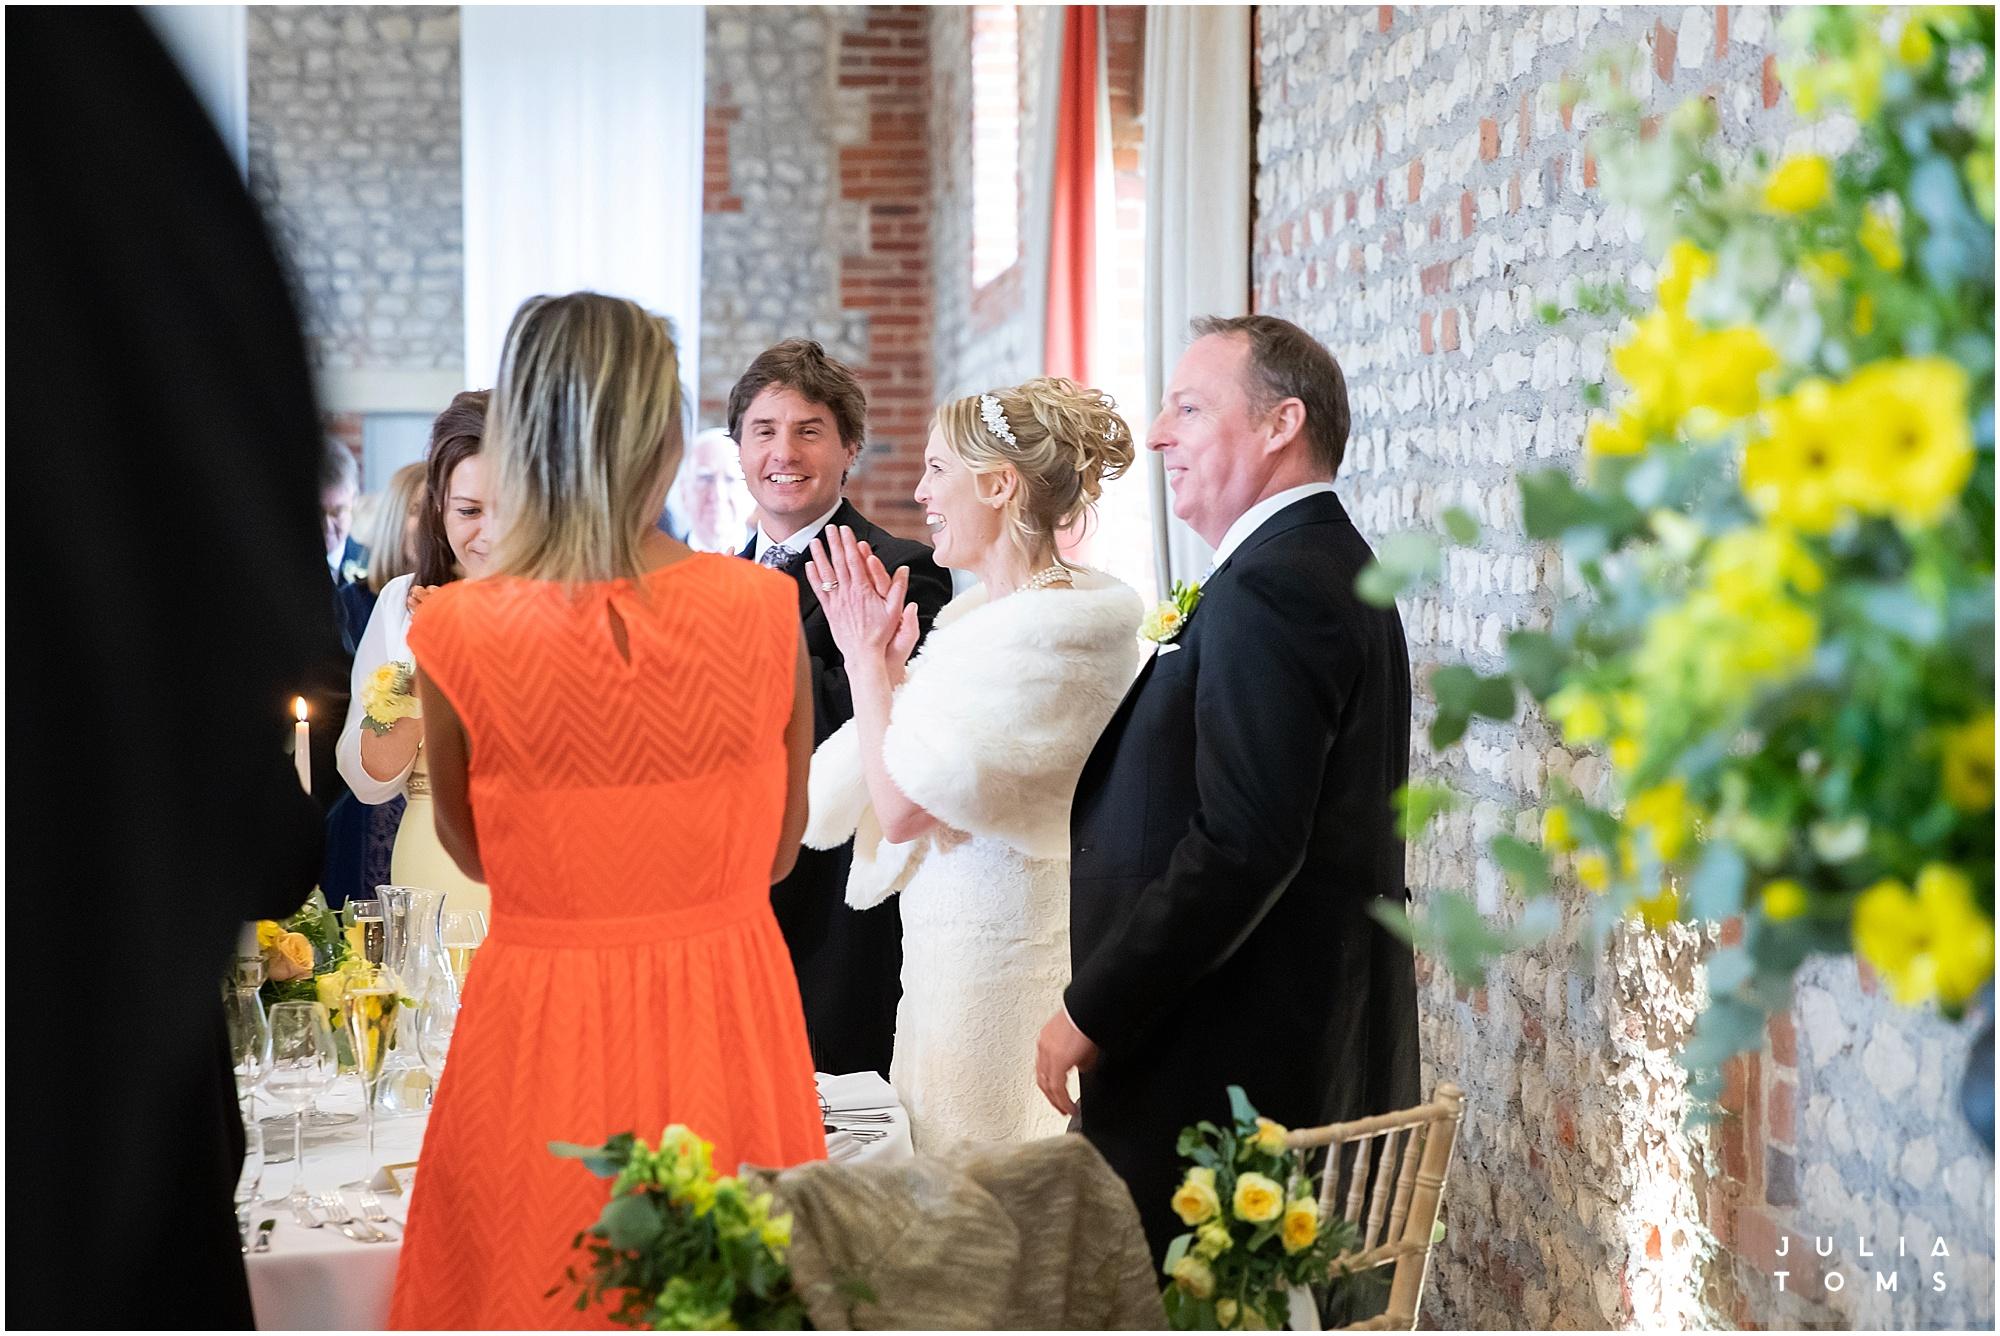 farbridge_barn_wedding_photographer_chichester_048.jpg